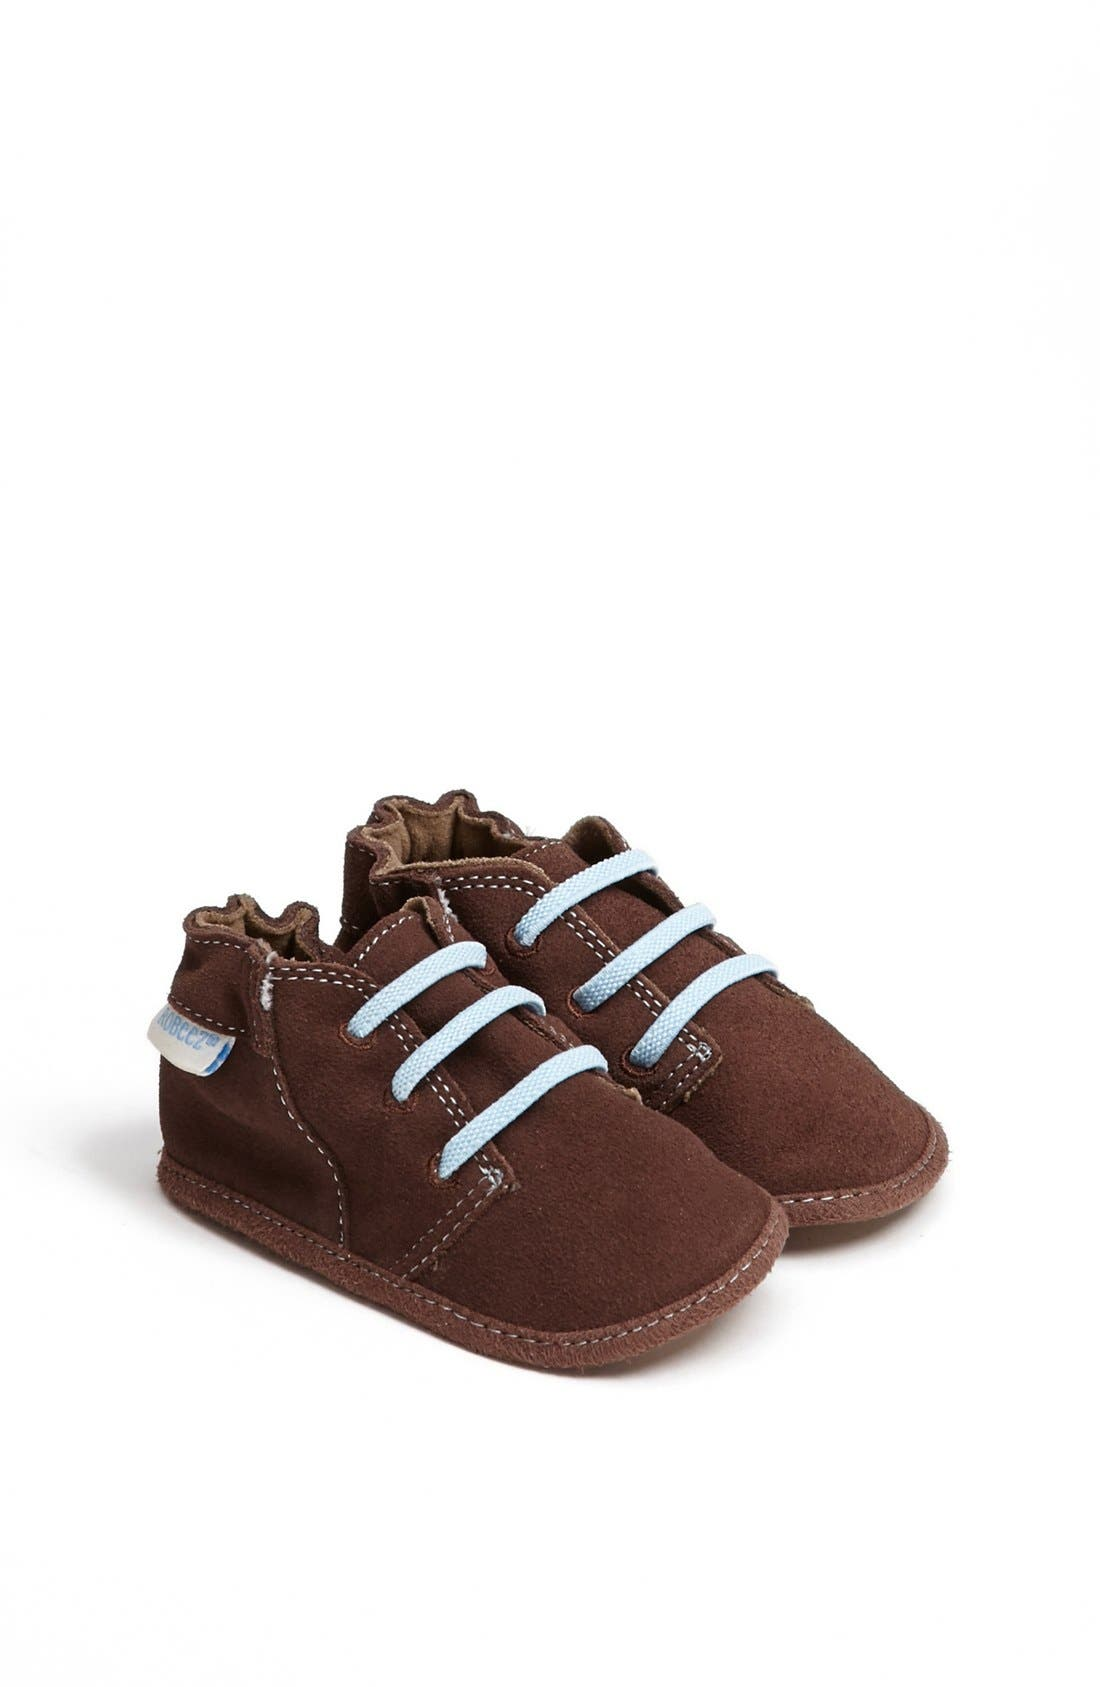 Alternate Image 1 Selected - Robeez® 'Charlie' Crib Shoe (Baby & Walker)